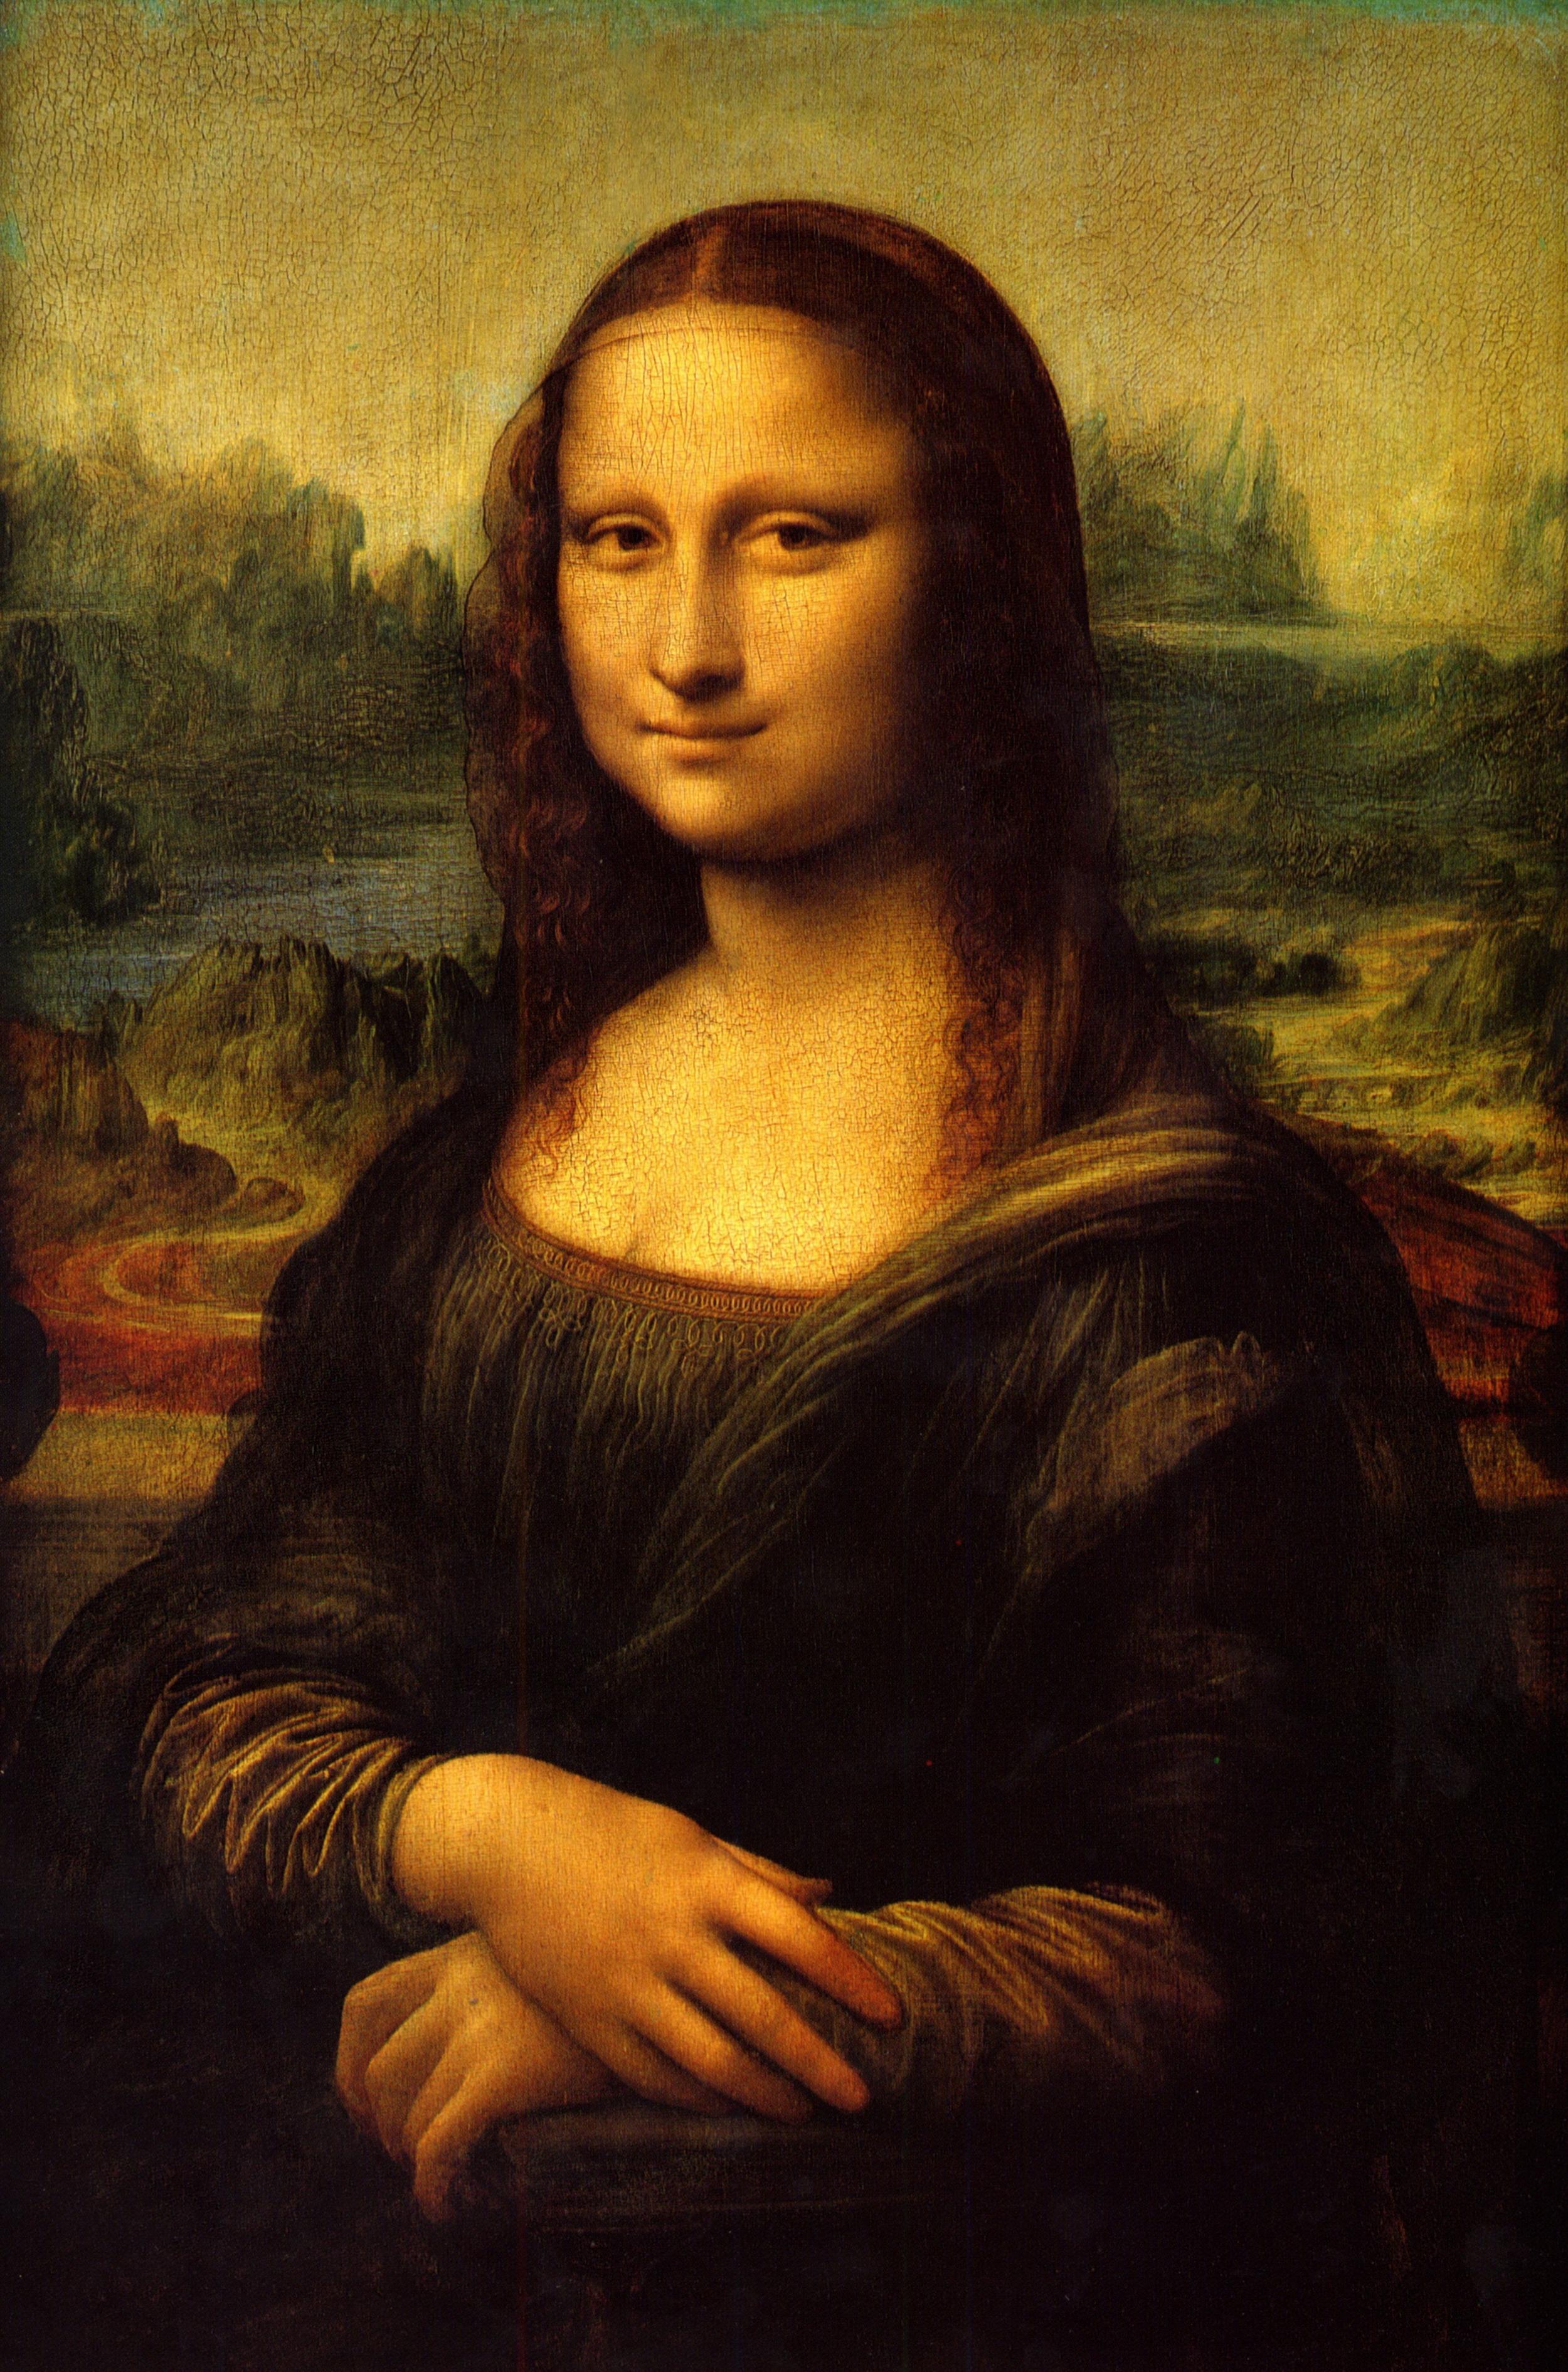 Leonardo da Vinci c.1503–1506, perhaps continuing untilc.1517Musee du Louvre,Paris